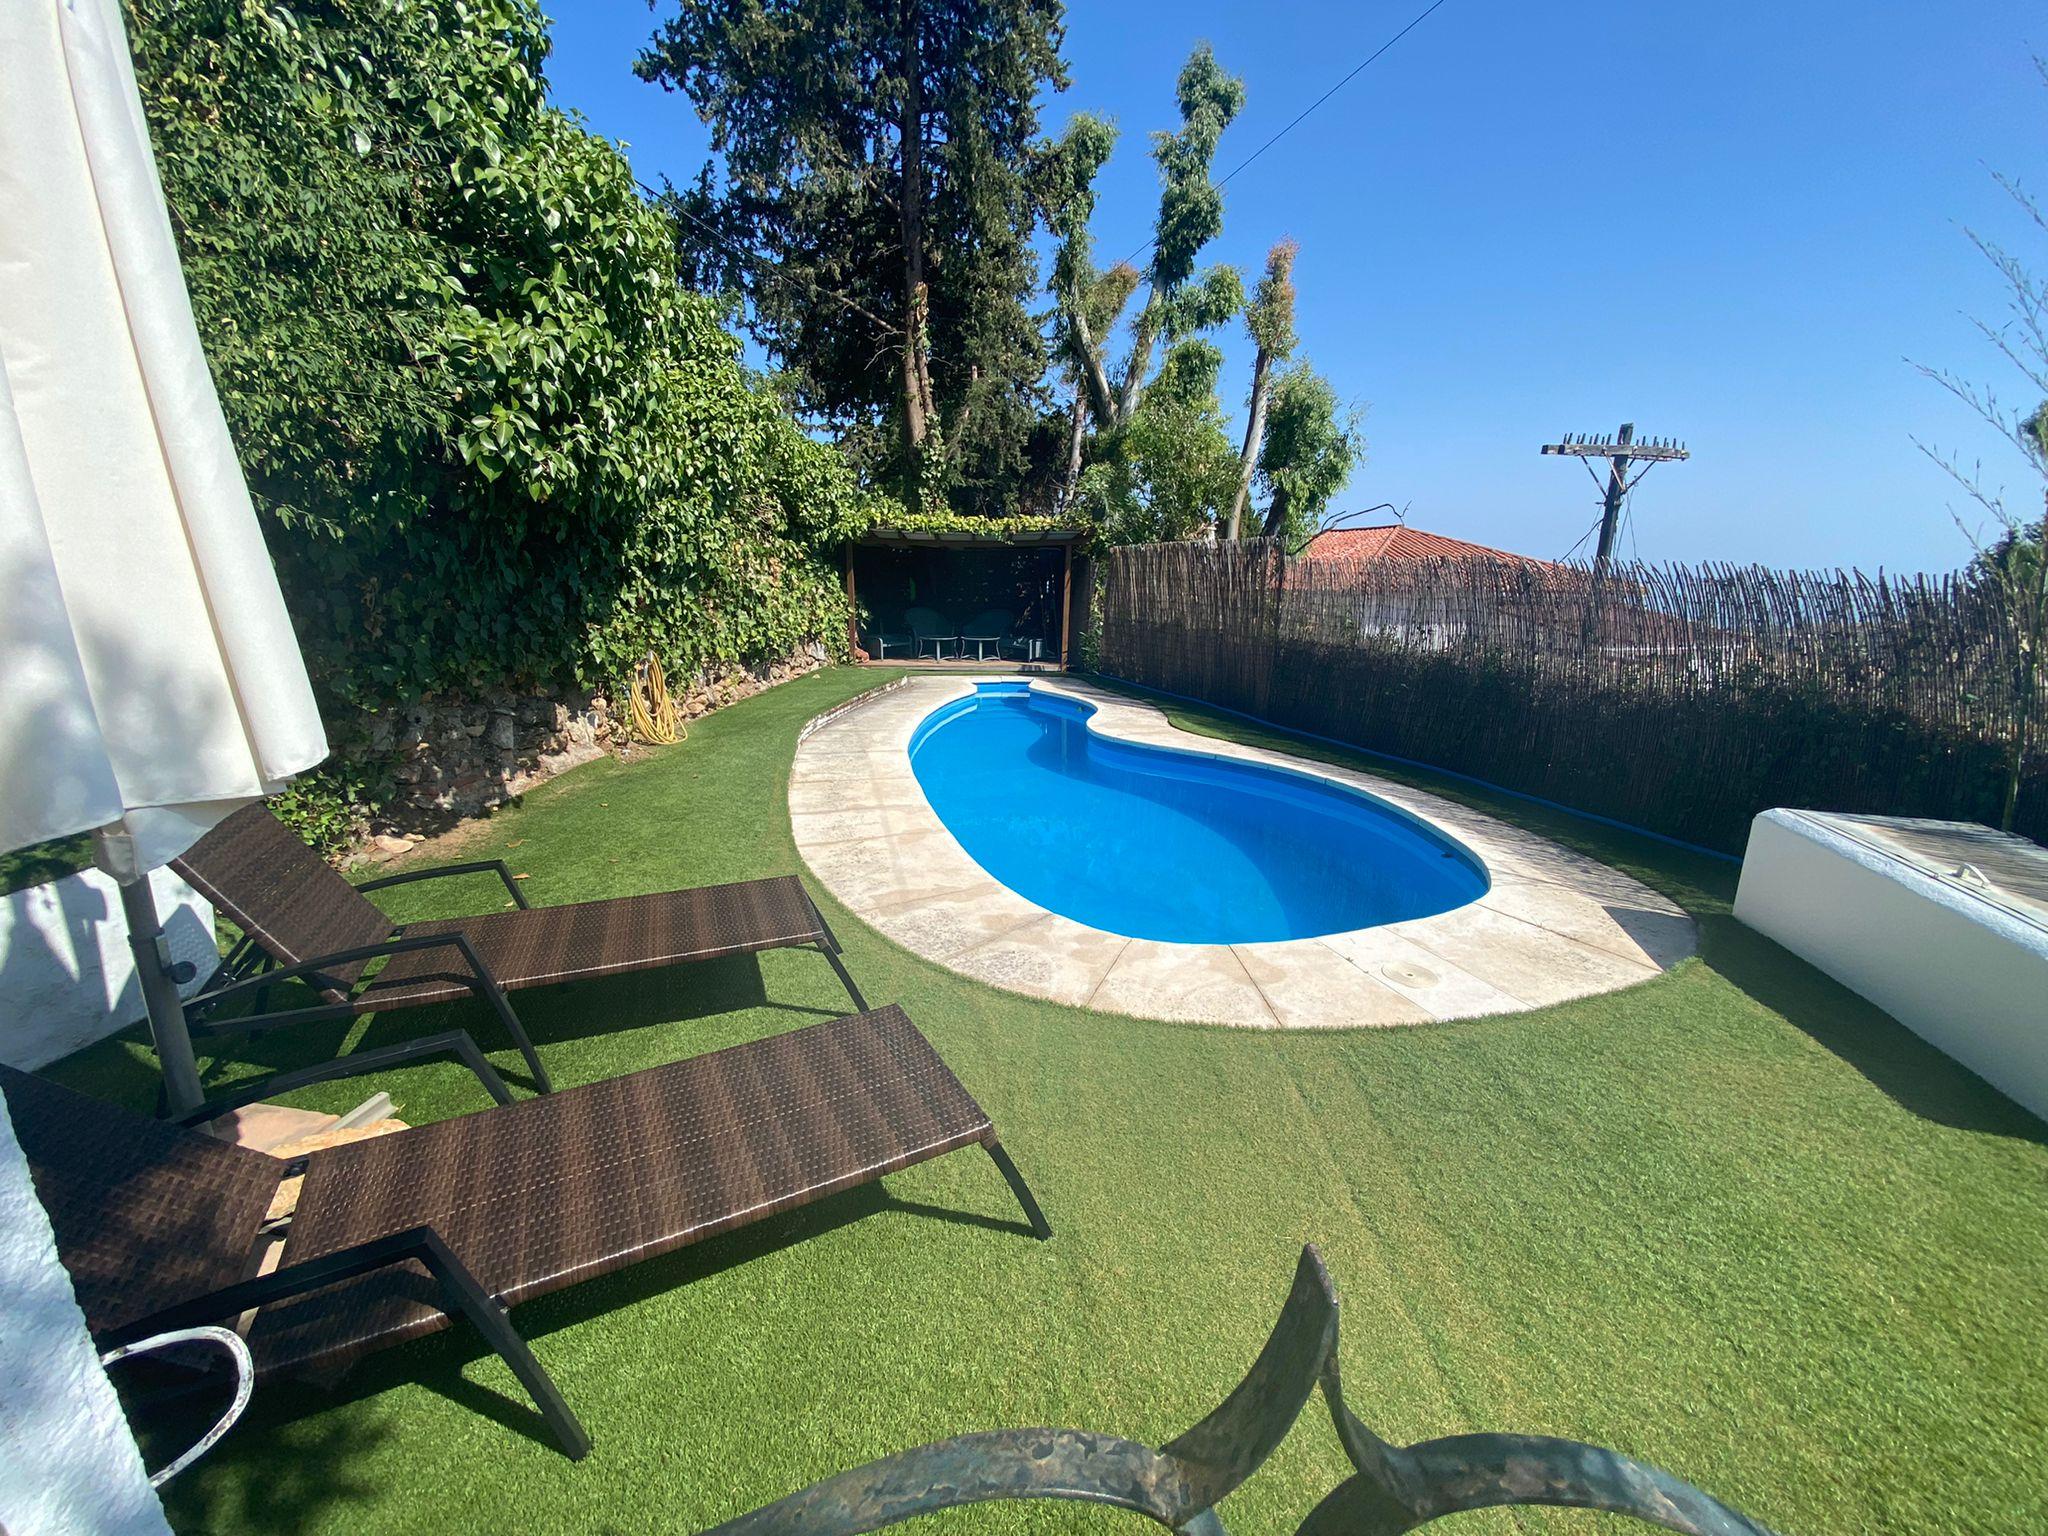 4 bedroom villa on the hills above Marbella, stunning sea views